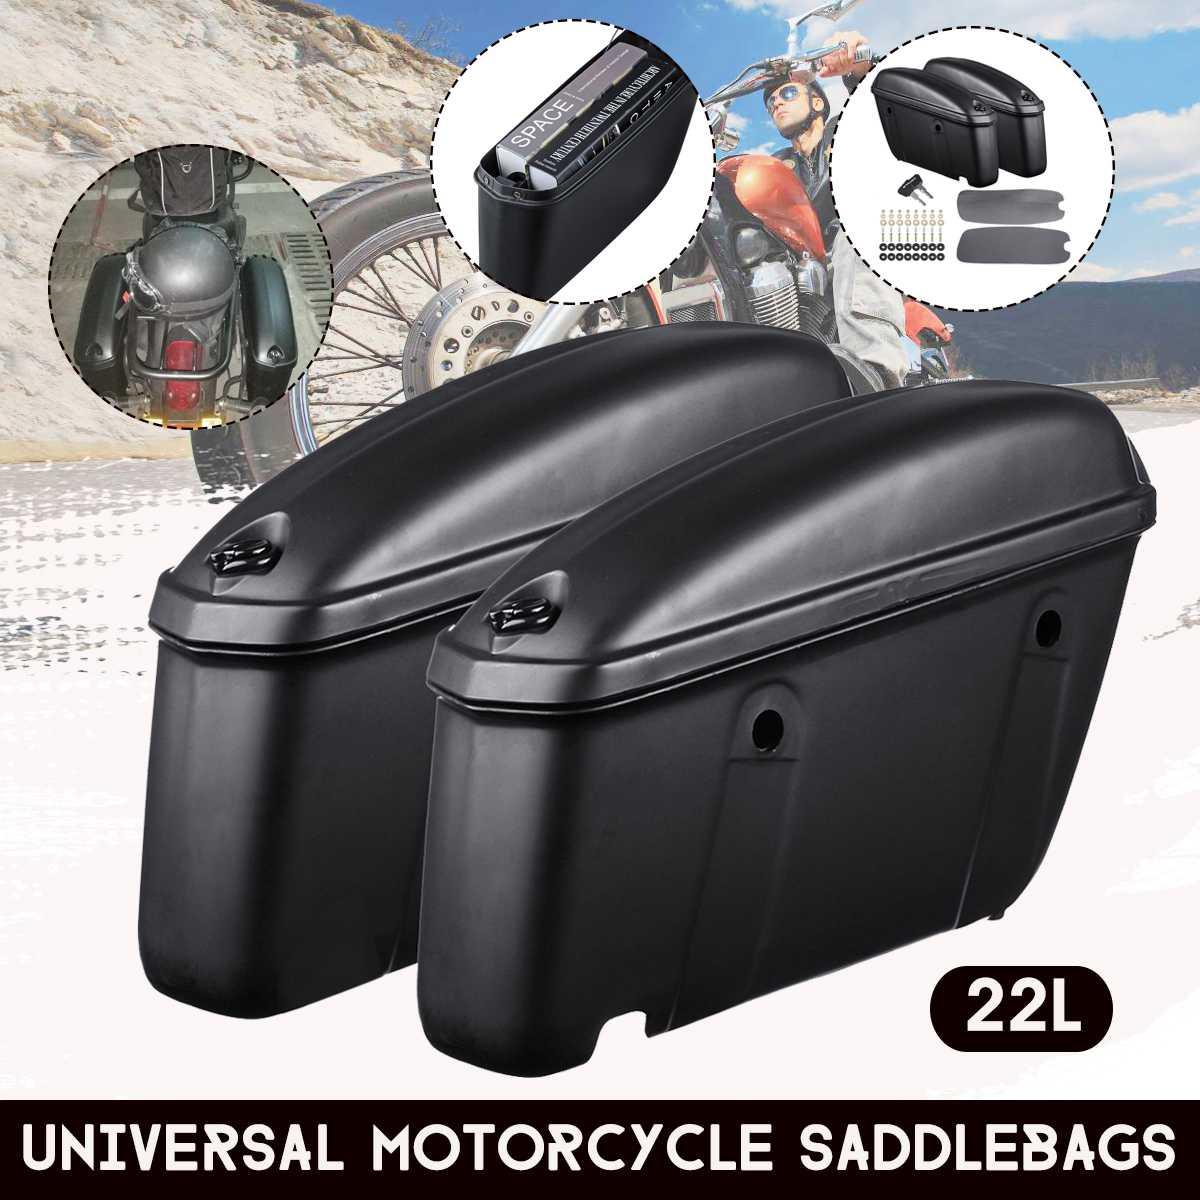 Par universal caso tronco rígido da motocicleta sela saco de bagagem lateral caixa alforjes para suzuki/yamaha/honda